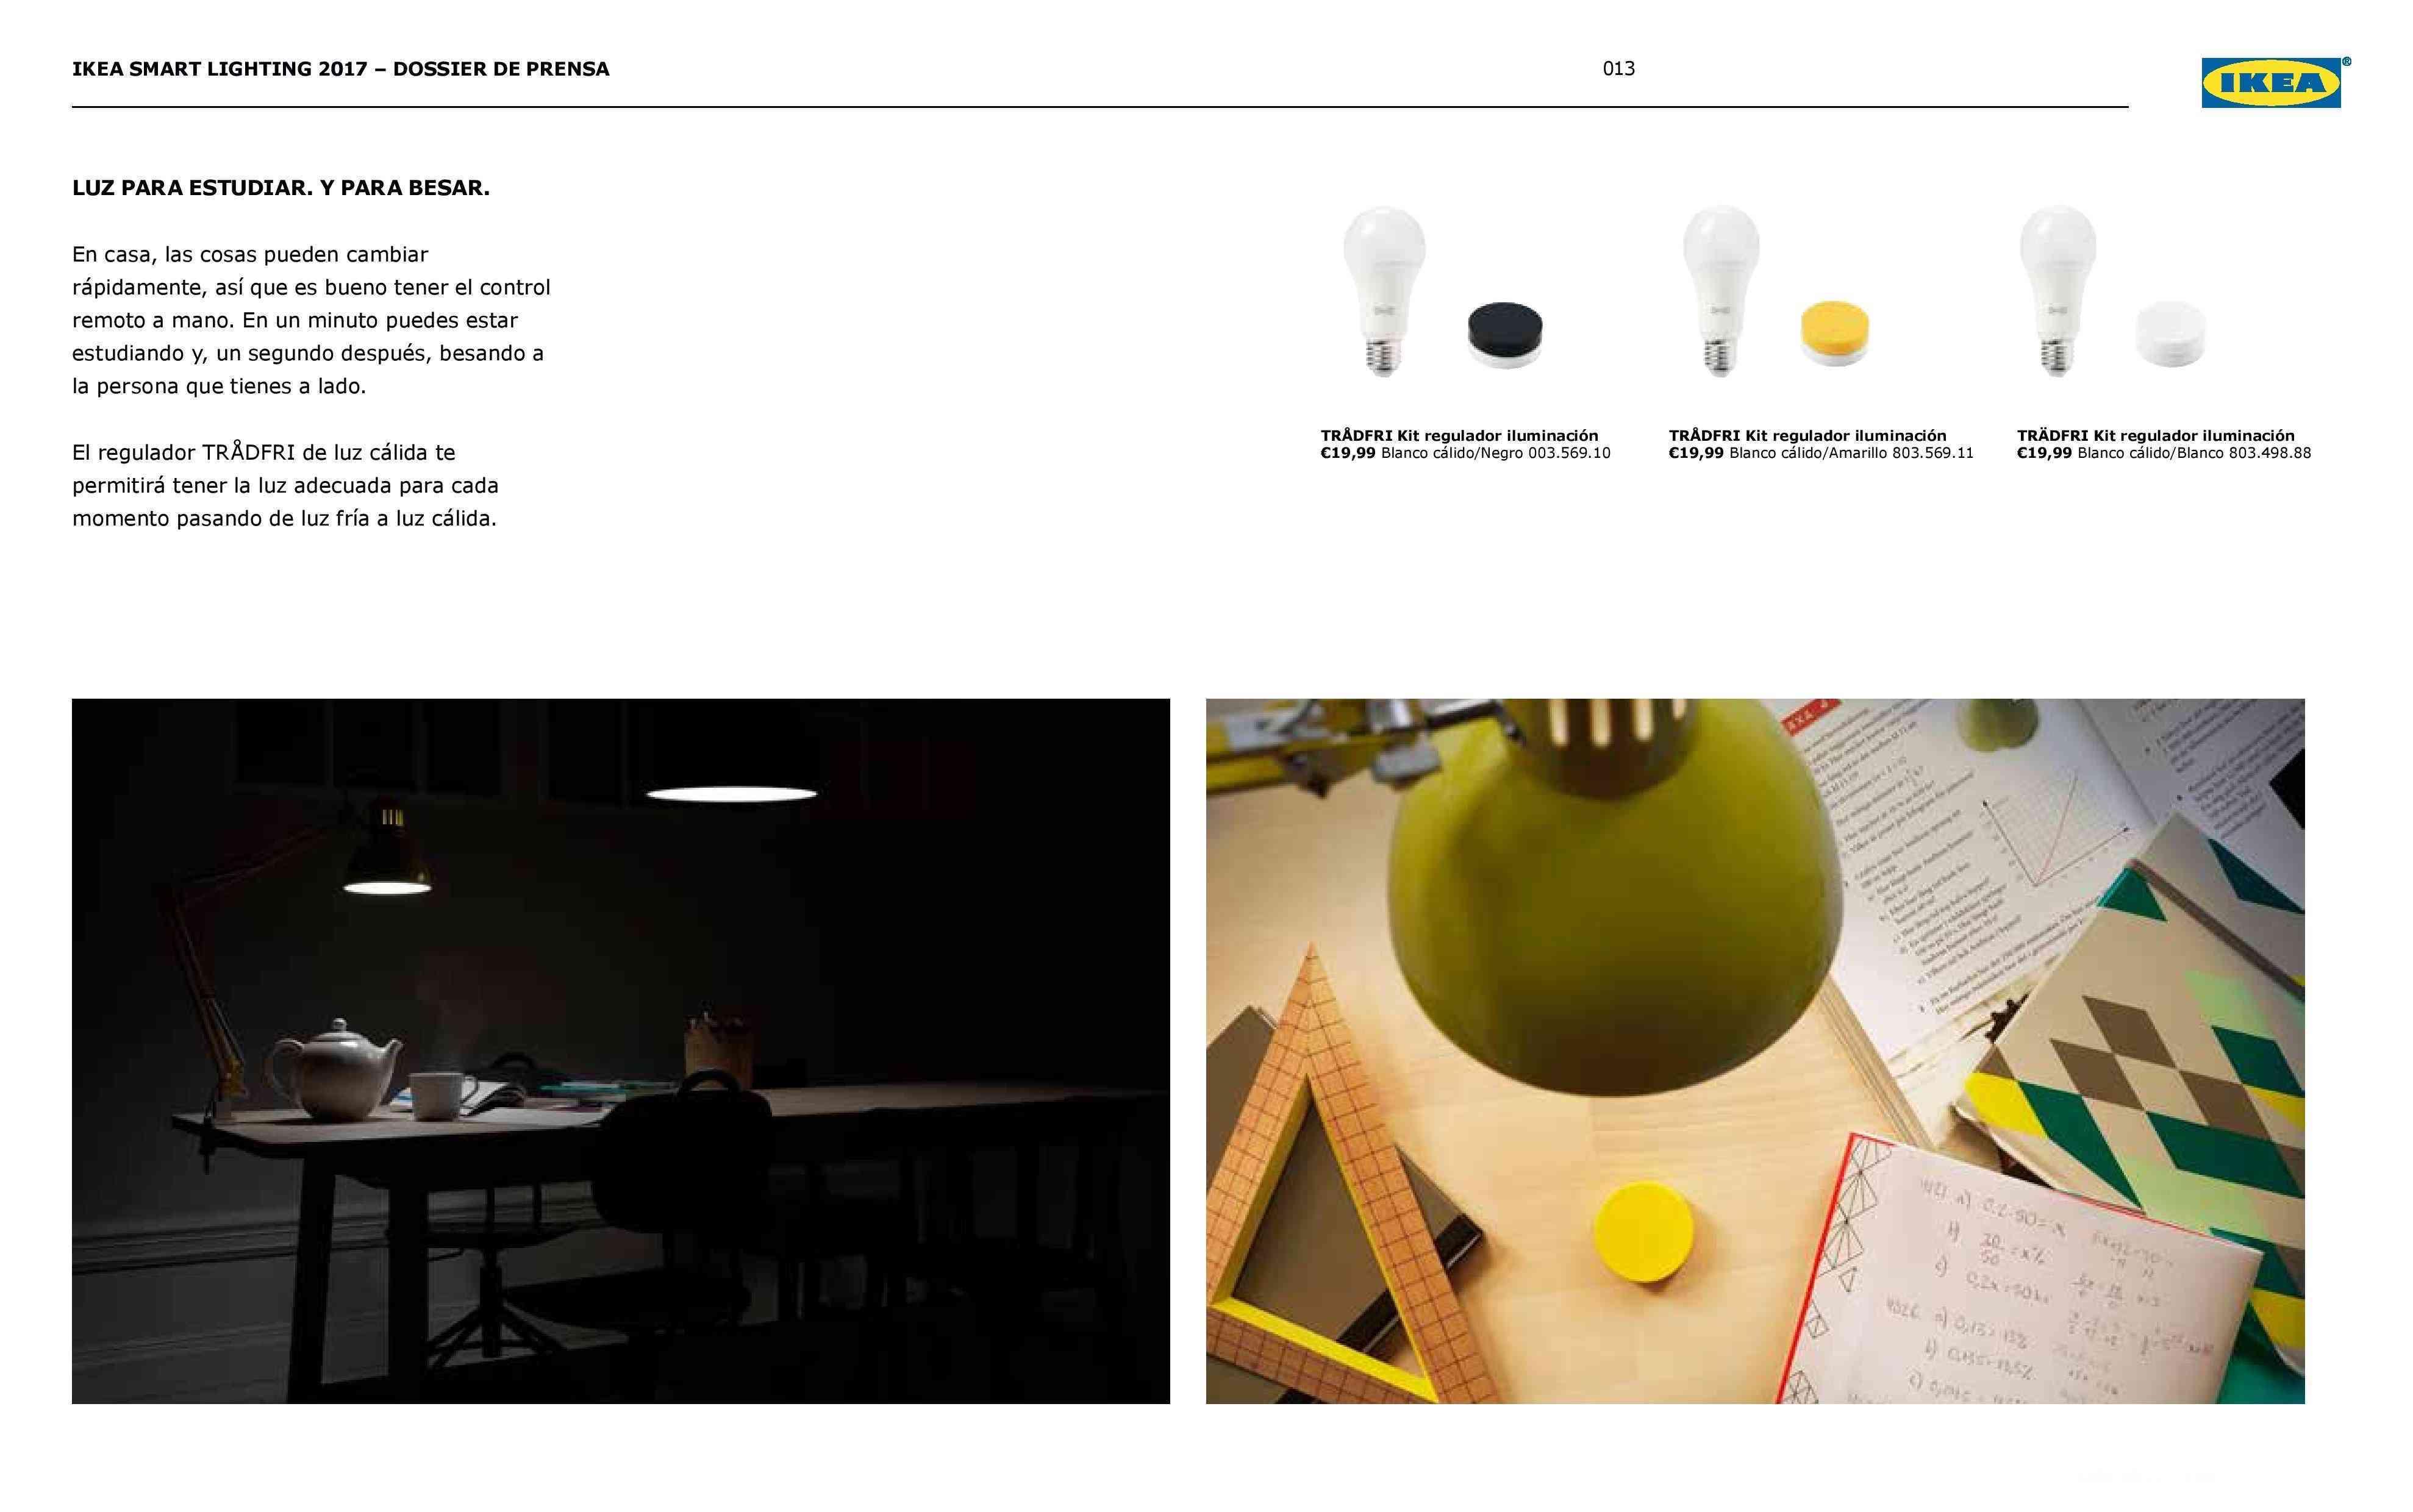 Novedades en iluminación de casas inteligentes con IKEA 69